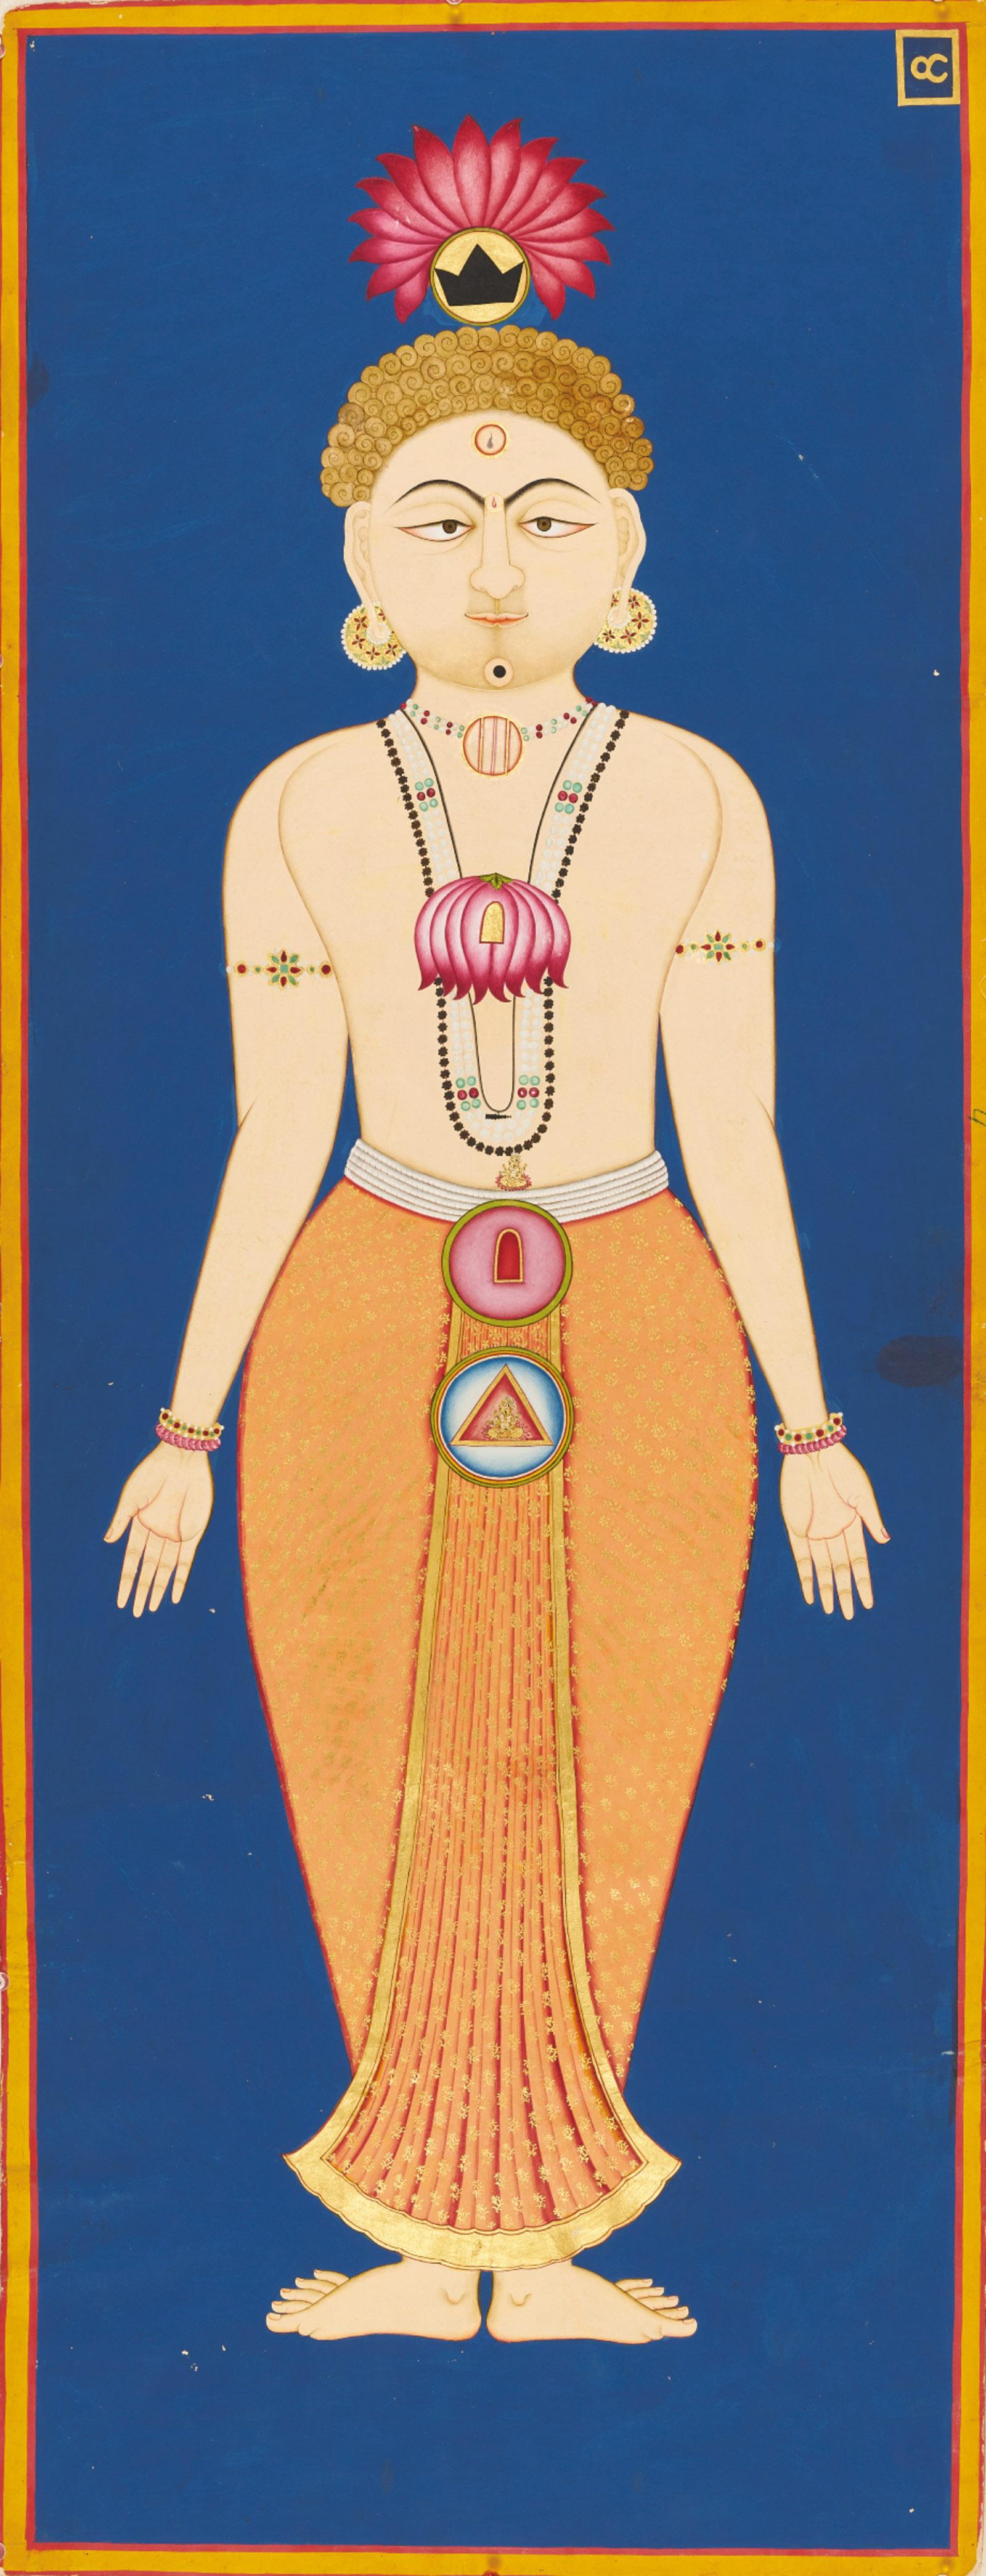 Chakras of the Subtle Body from the Siddha Siddhant Paddhati